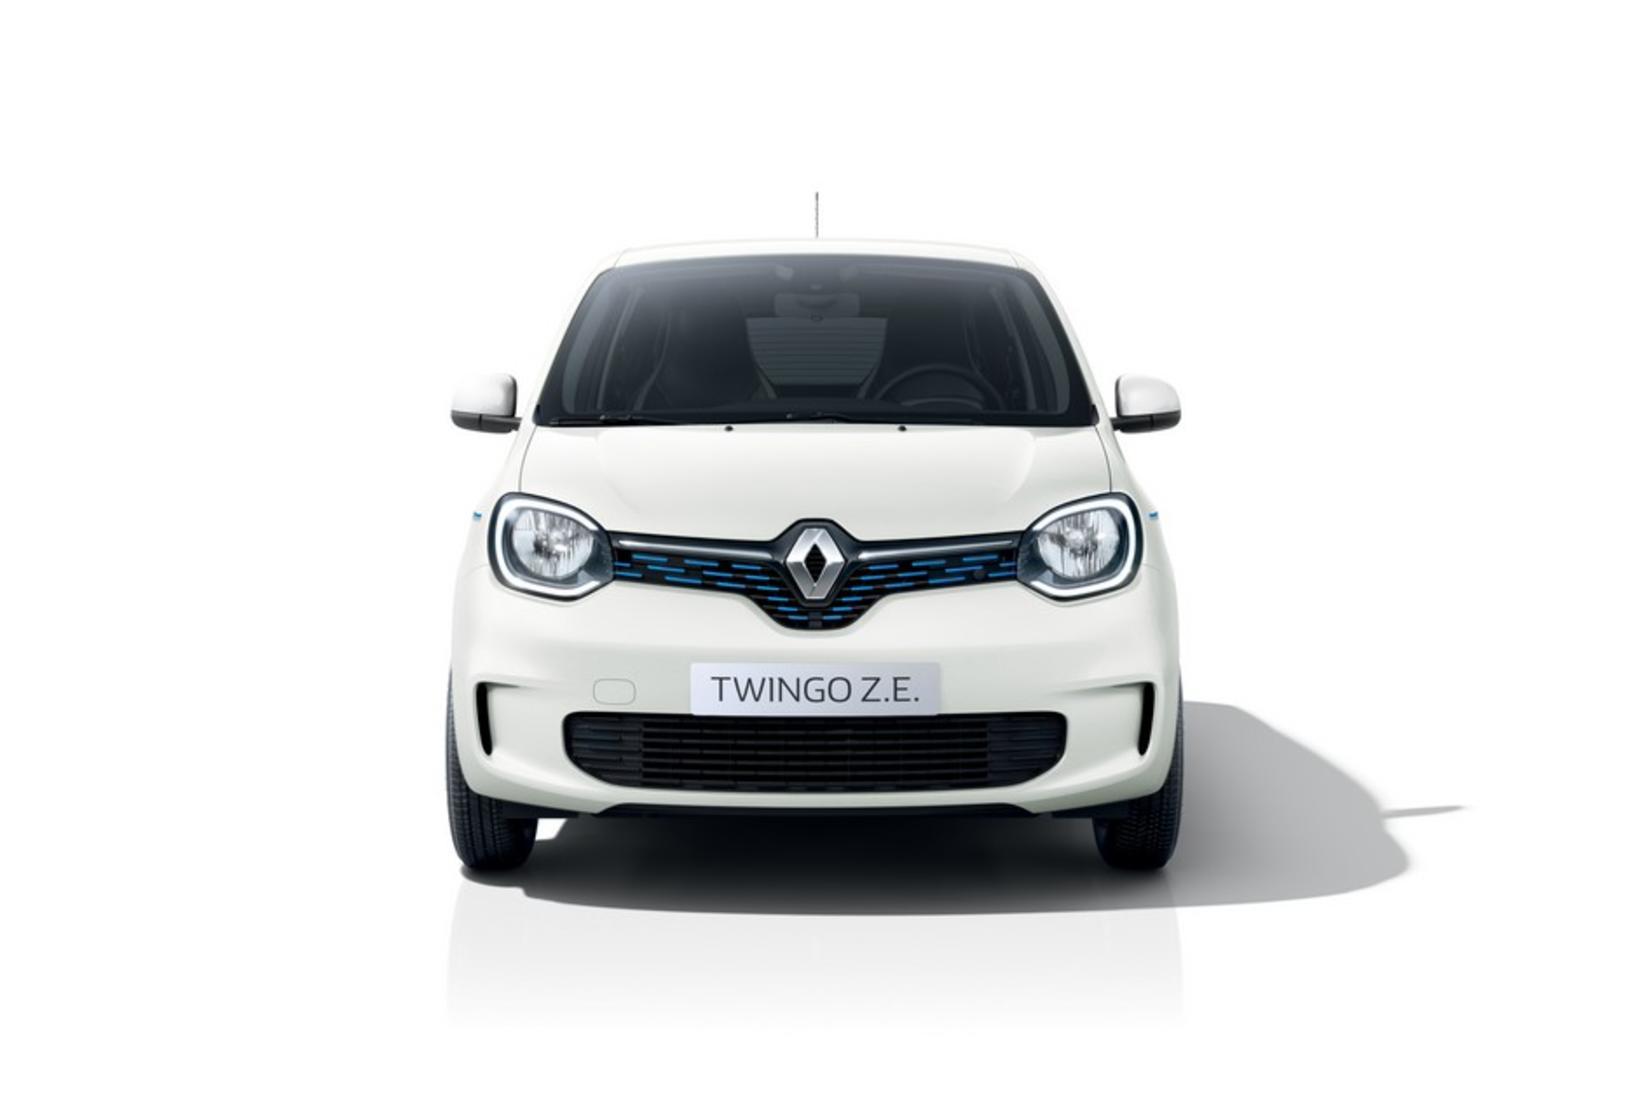 Rafbíllinn Renault Twingo Z.E.